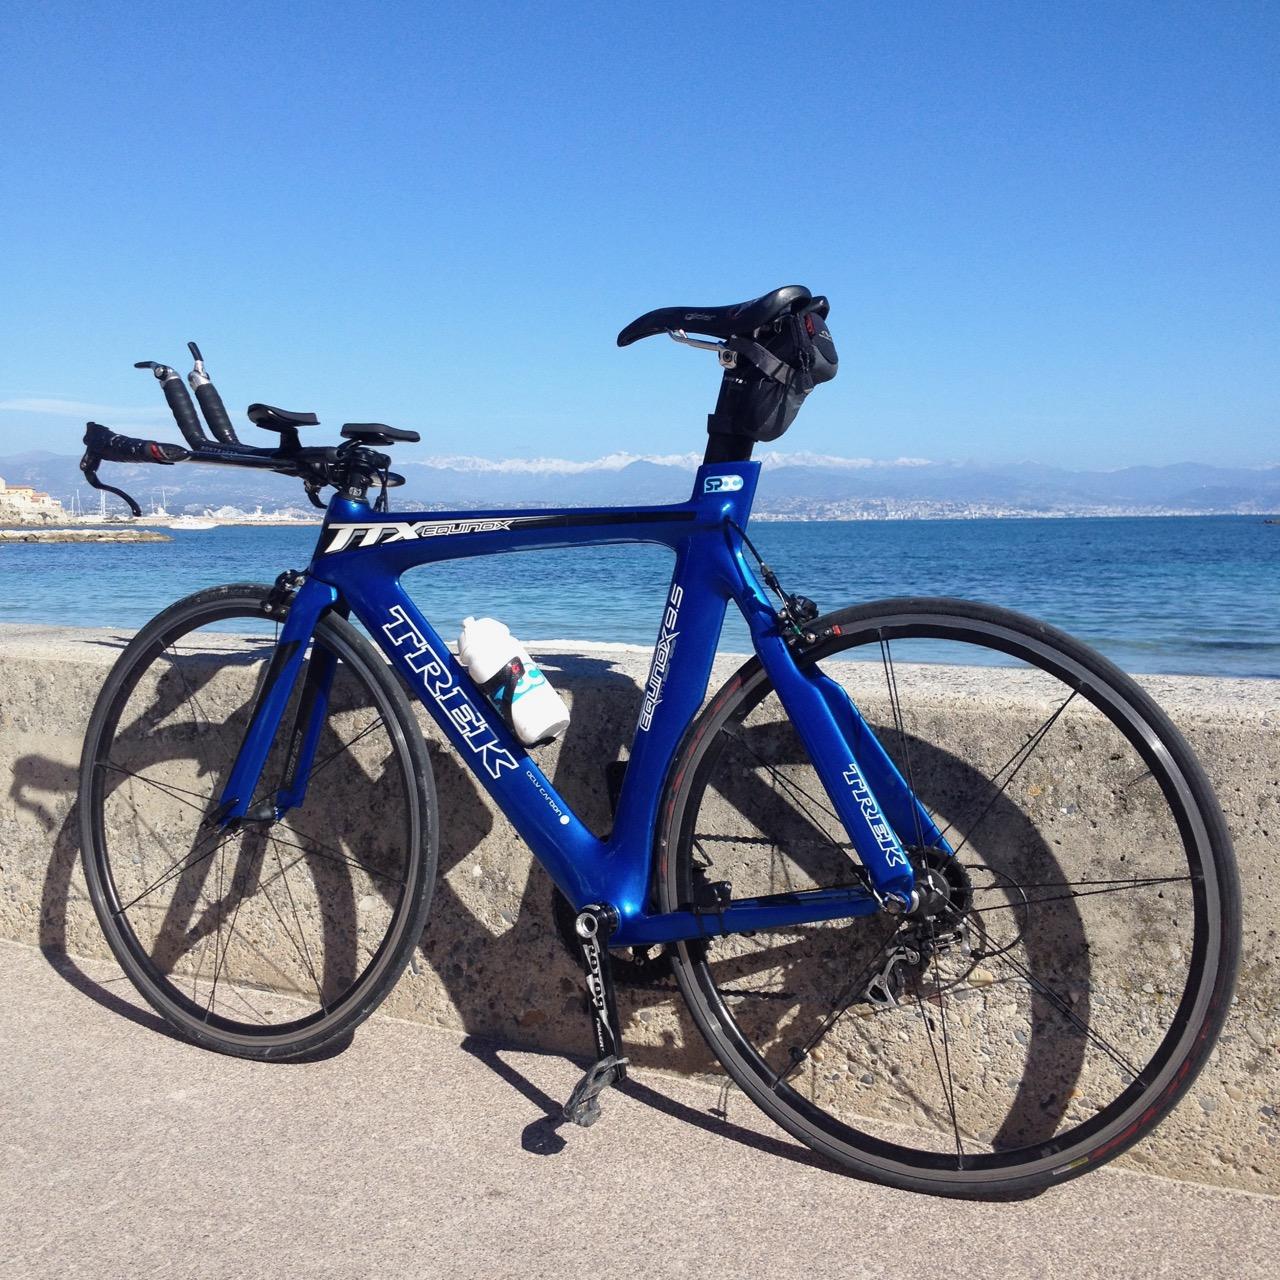 Coastal cycling the French mediterranean